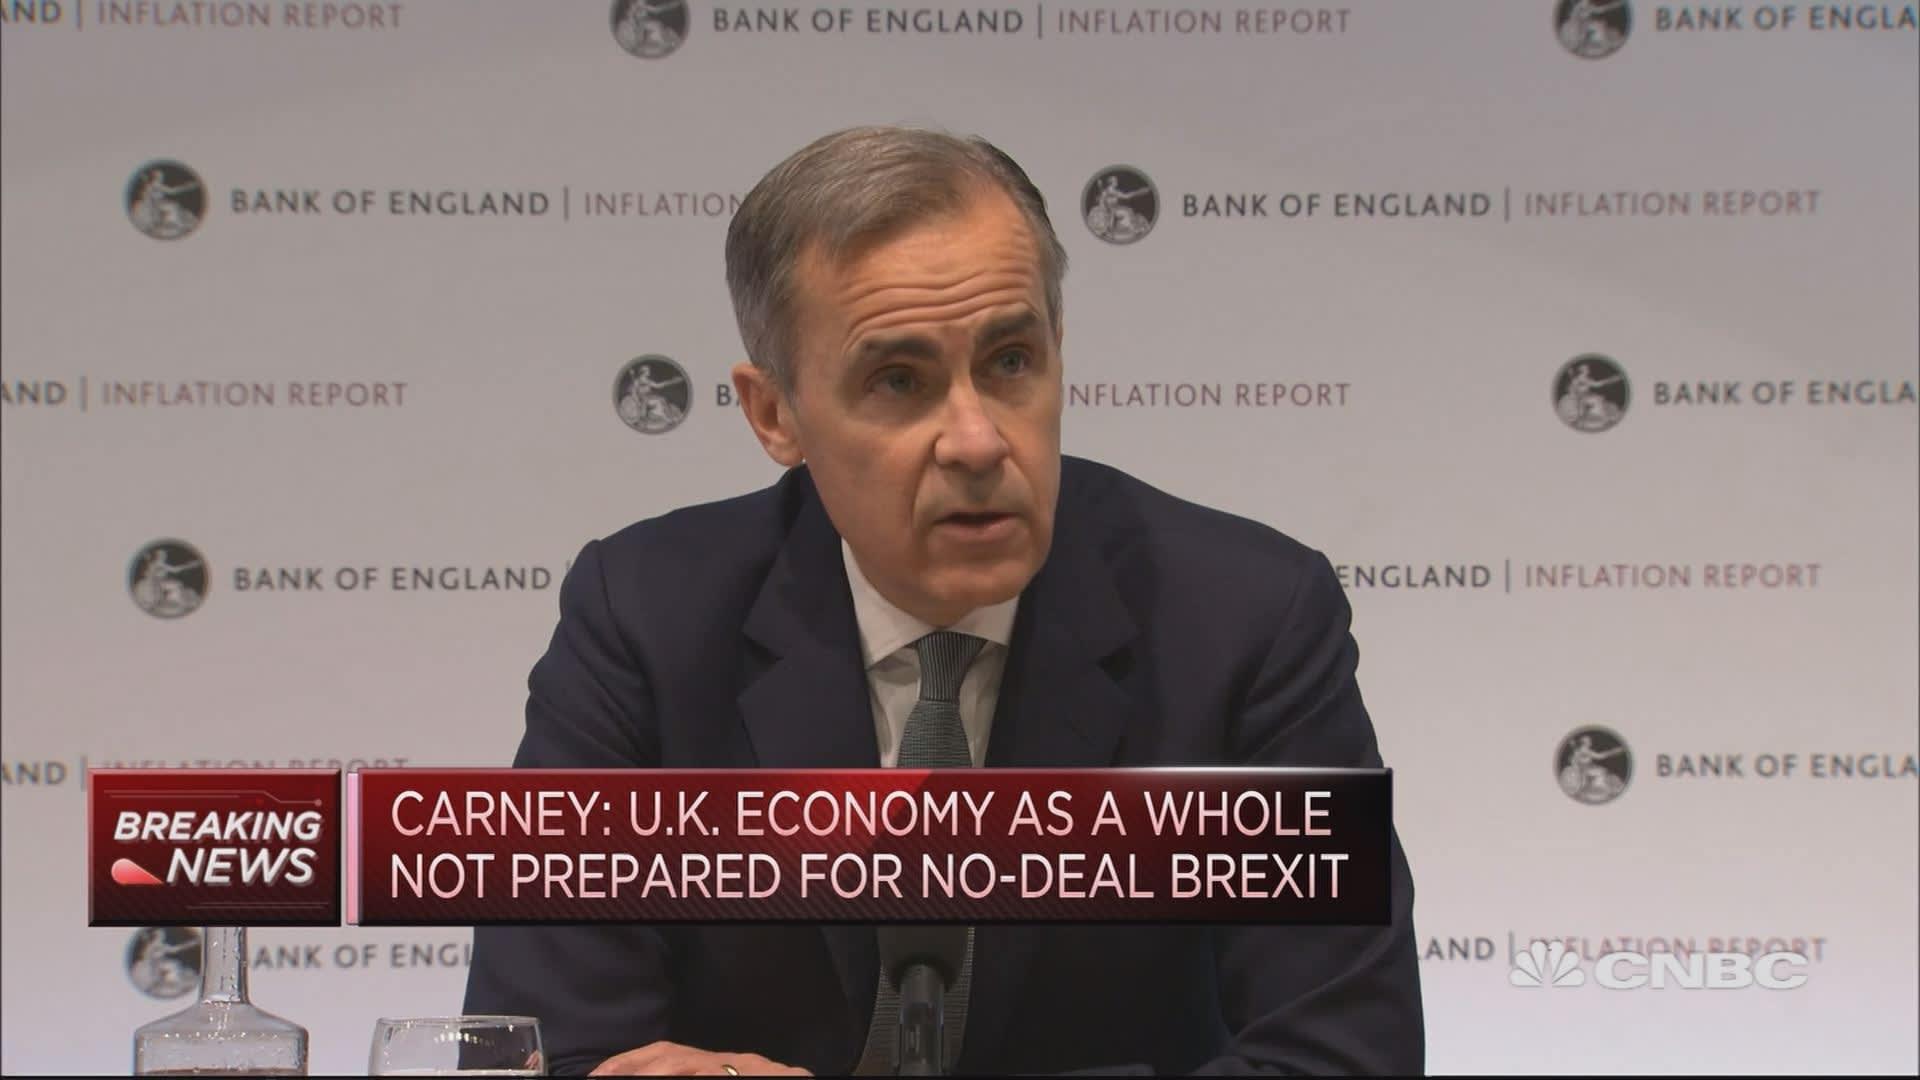 BOE's Carney: Fog of Brexit causing short-term volatility